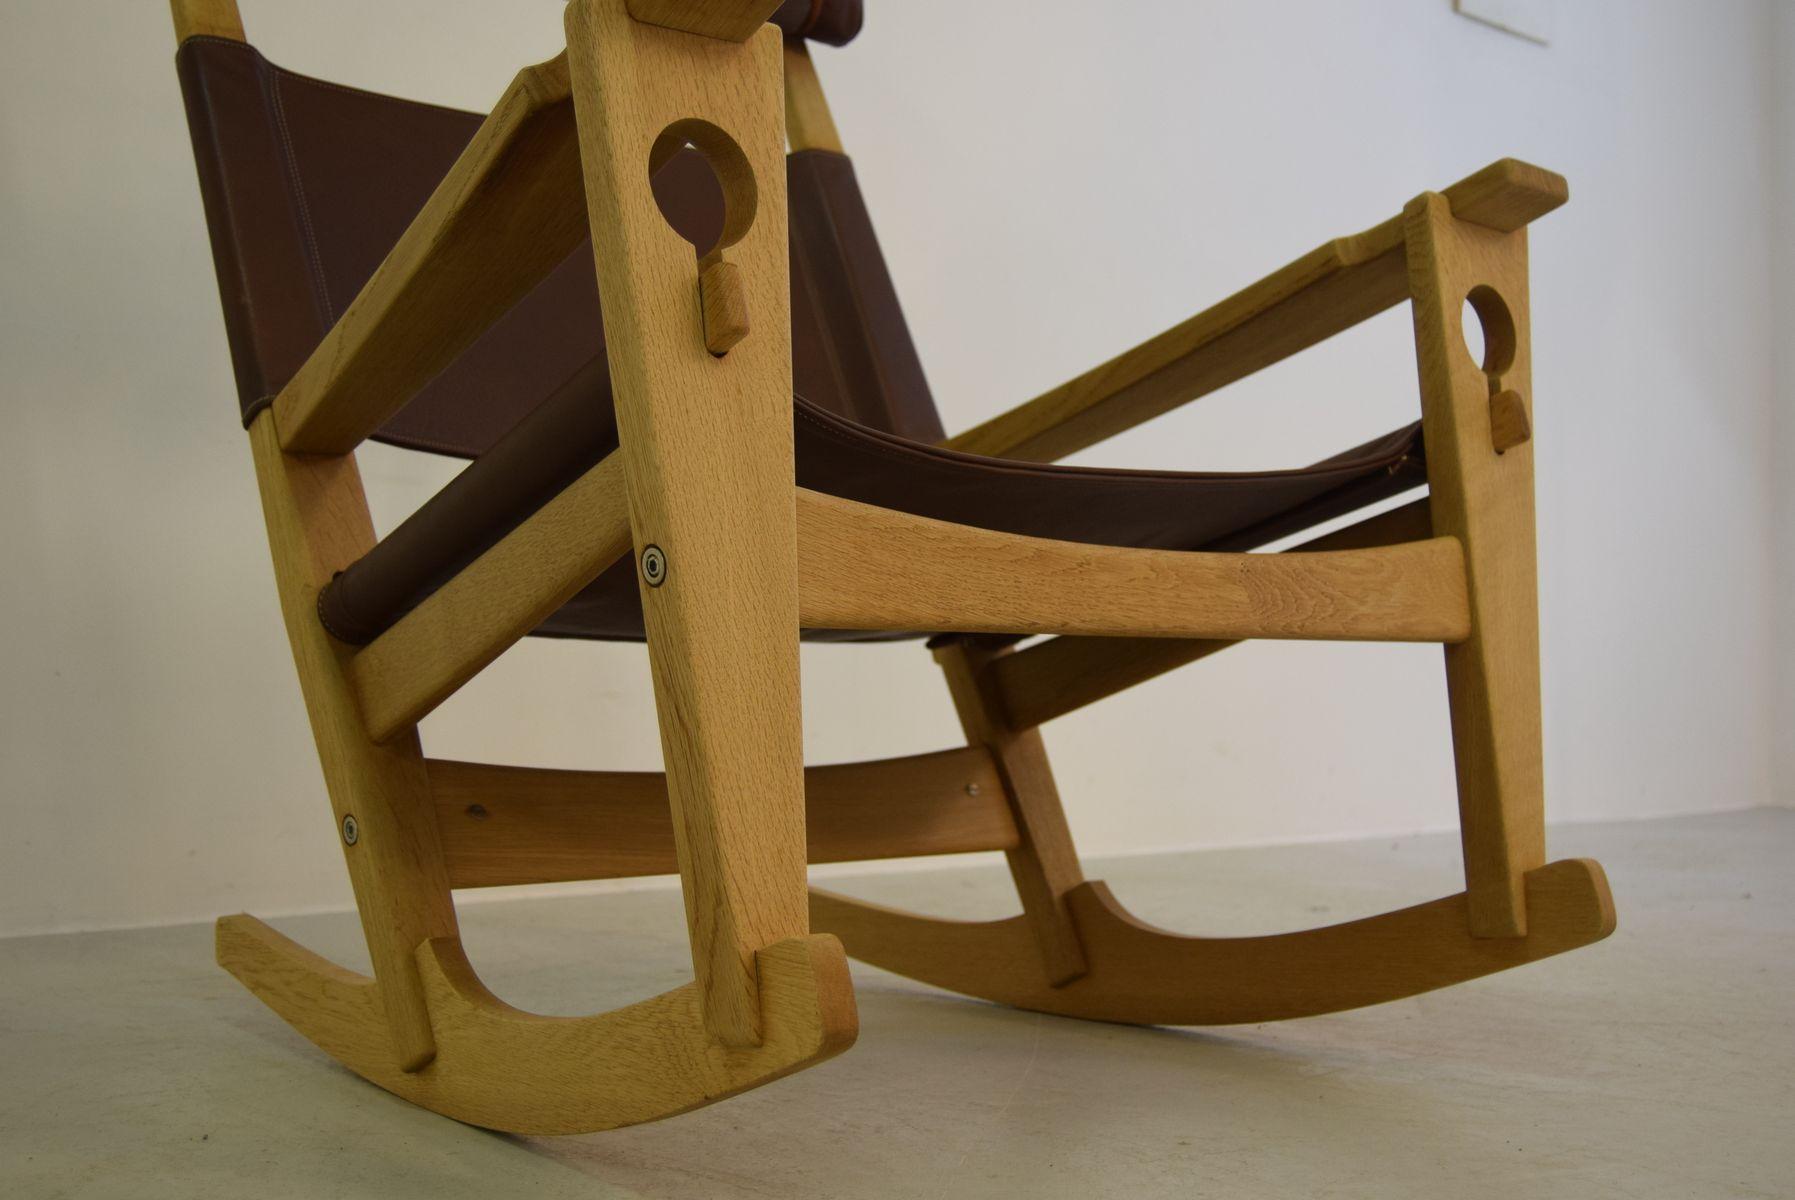 Keyhole Rocking Chair Model Ge 673 By Hans J Wegner For